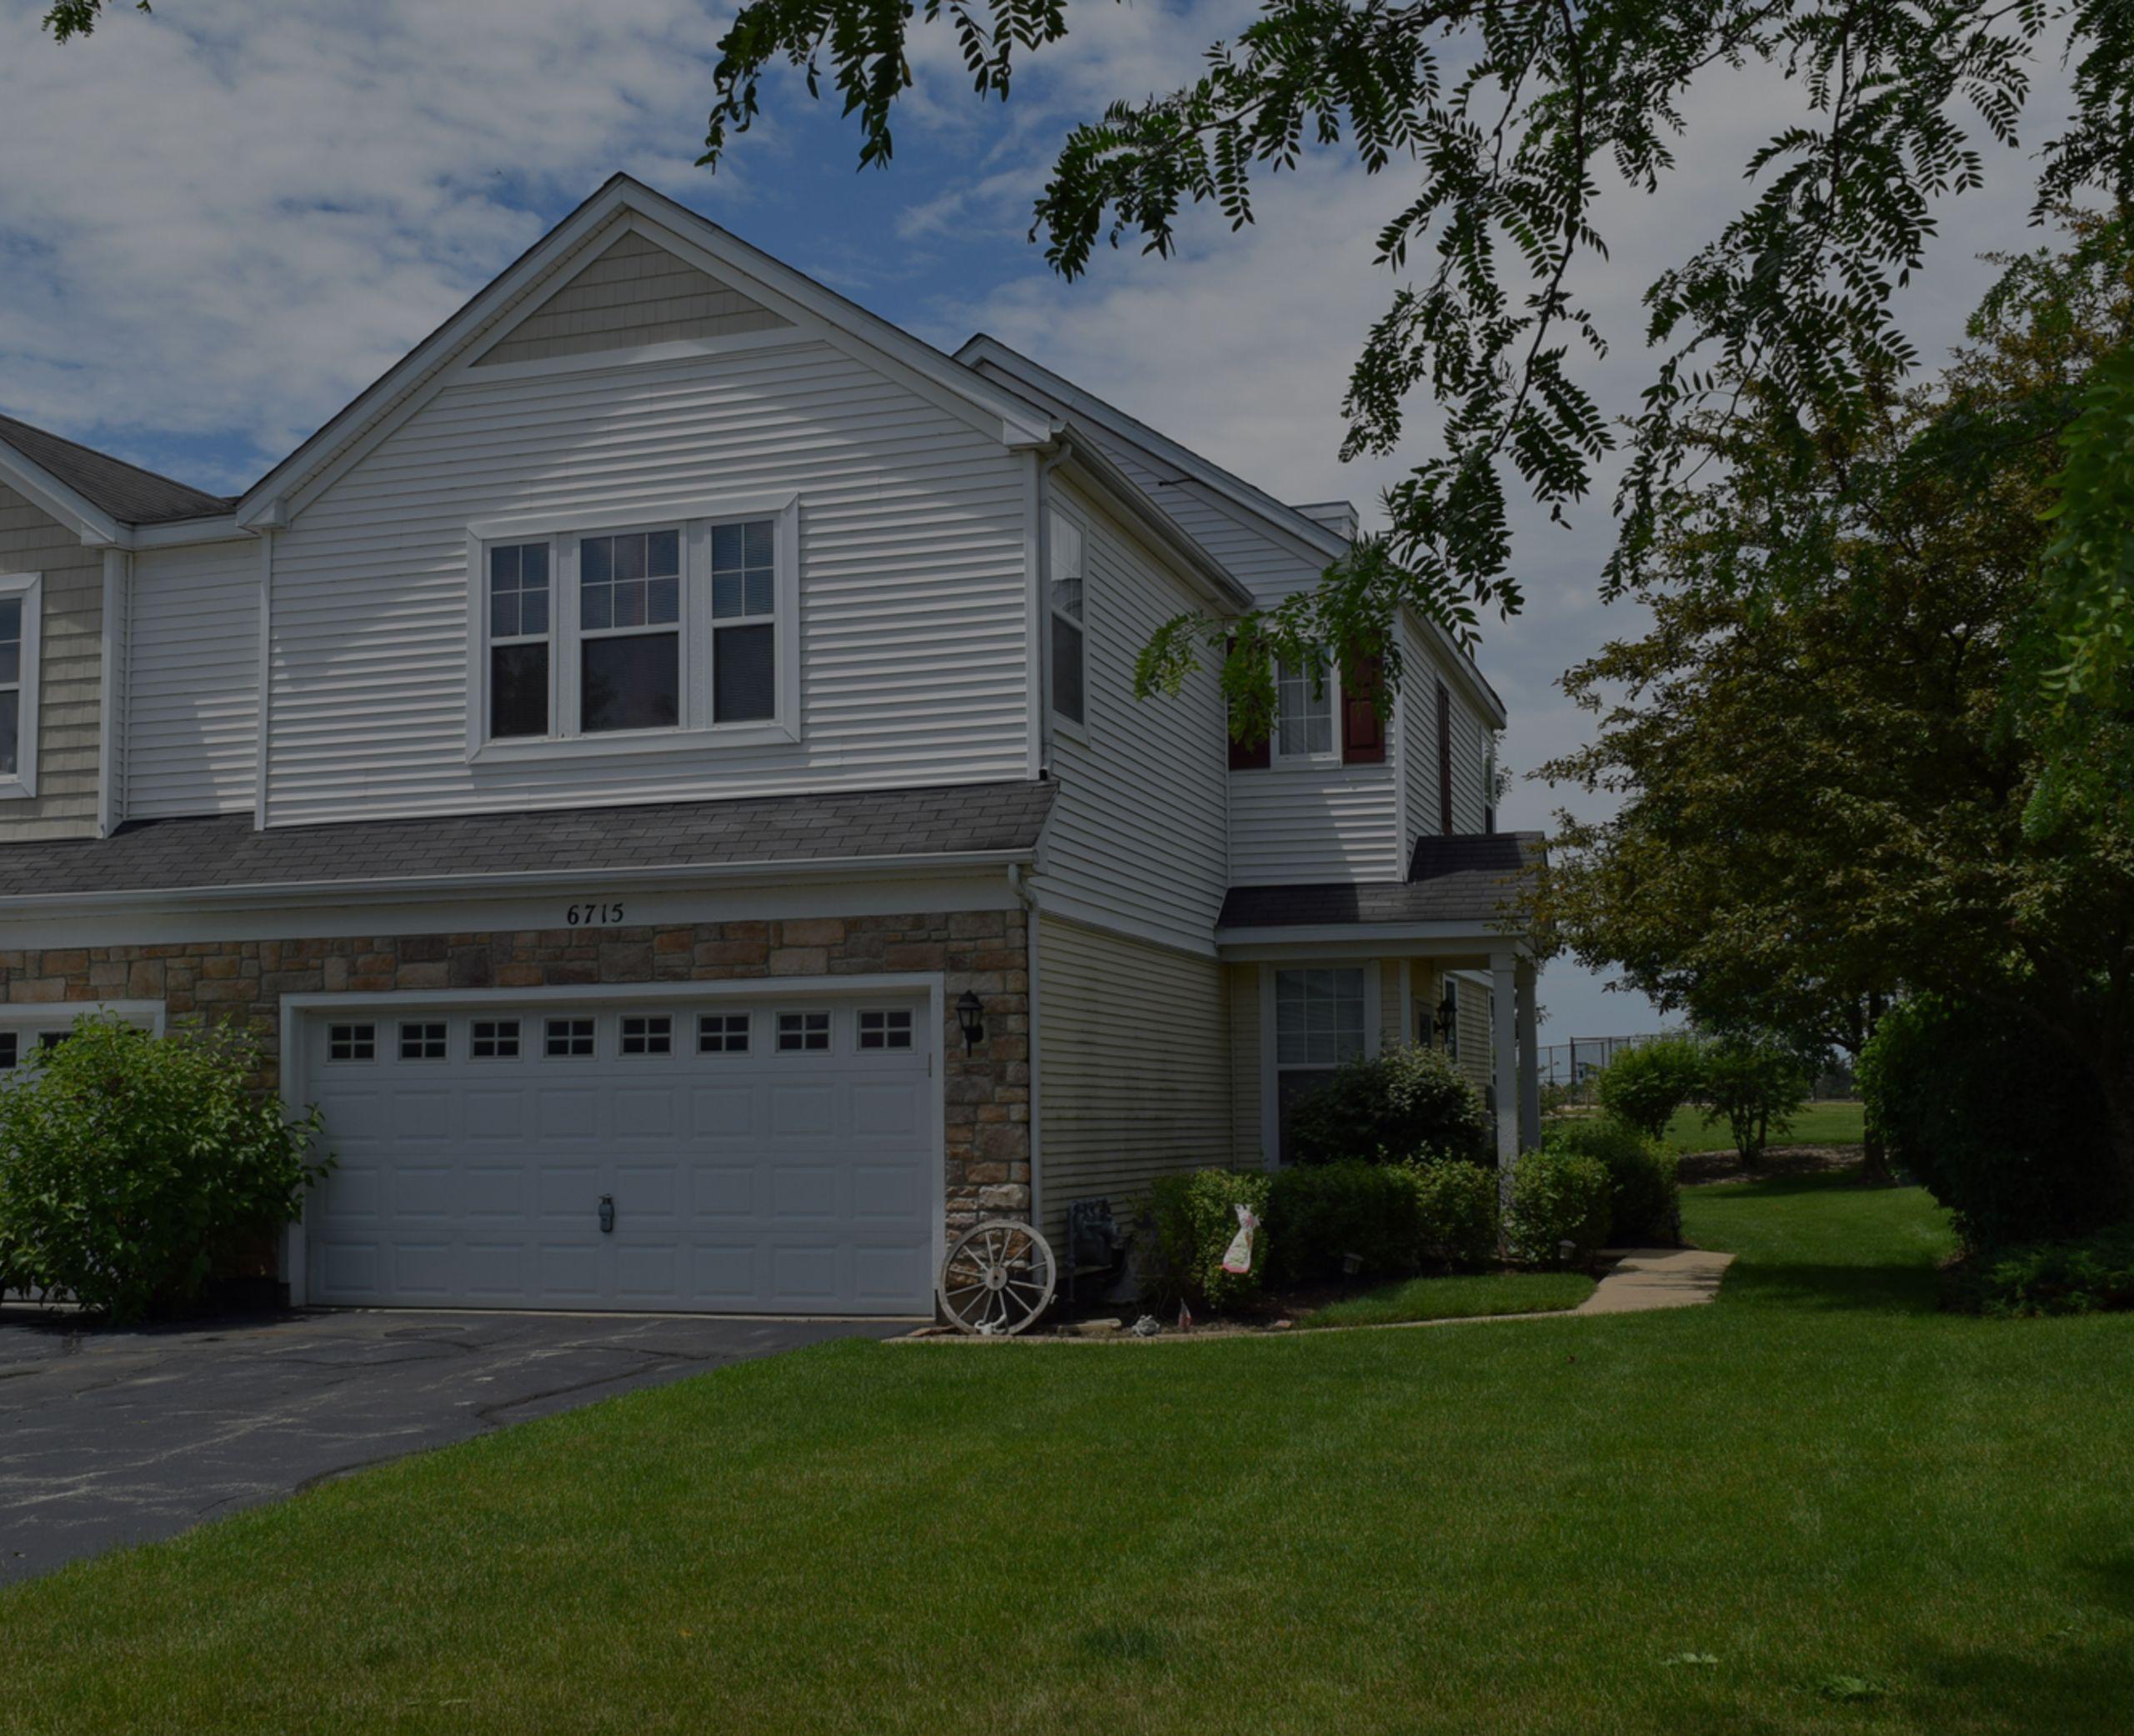 New Listing! 6715 Slate Drive, Carpentersville! $175,000